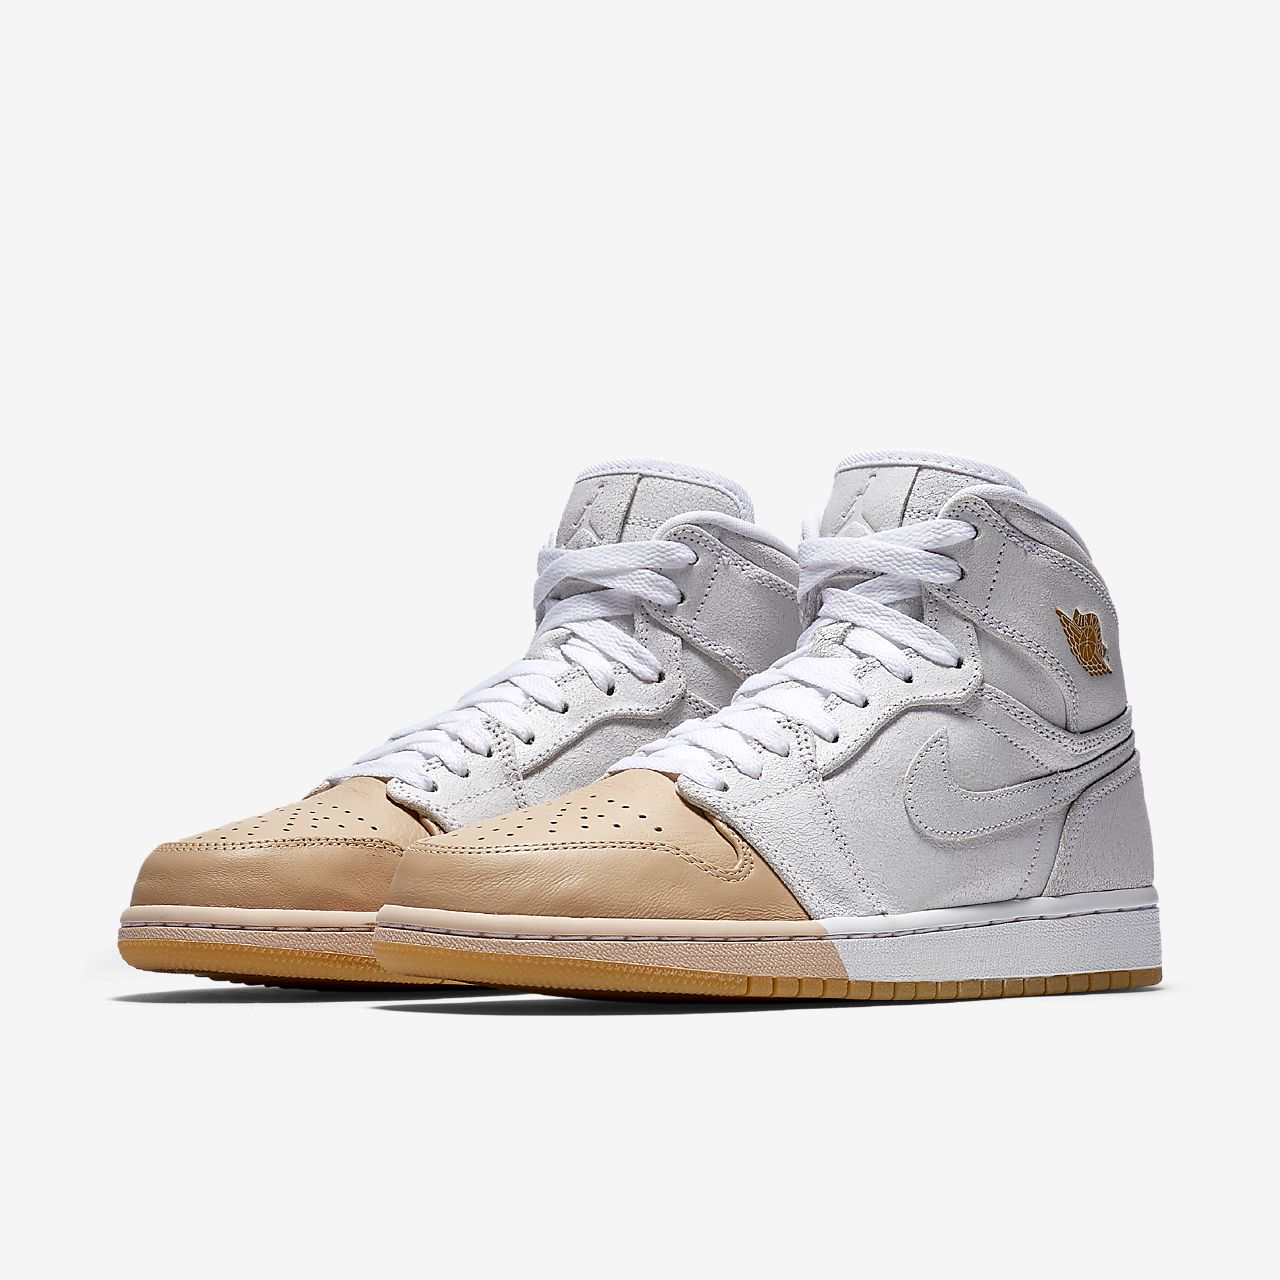 new arrival bb703 c891b ... Nike Air Jordan 1 Retro High Premium Women s Shoe